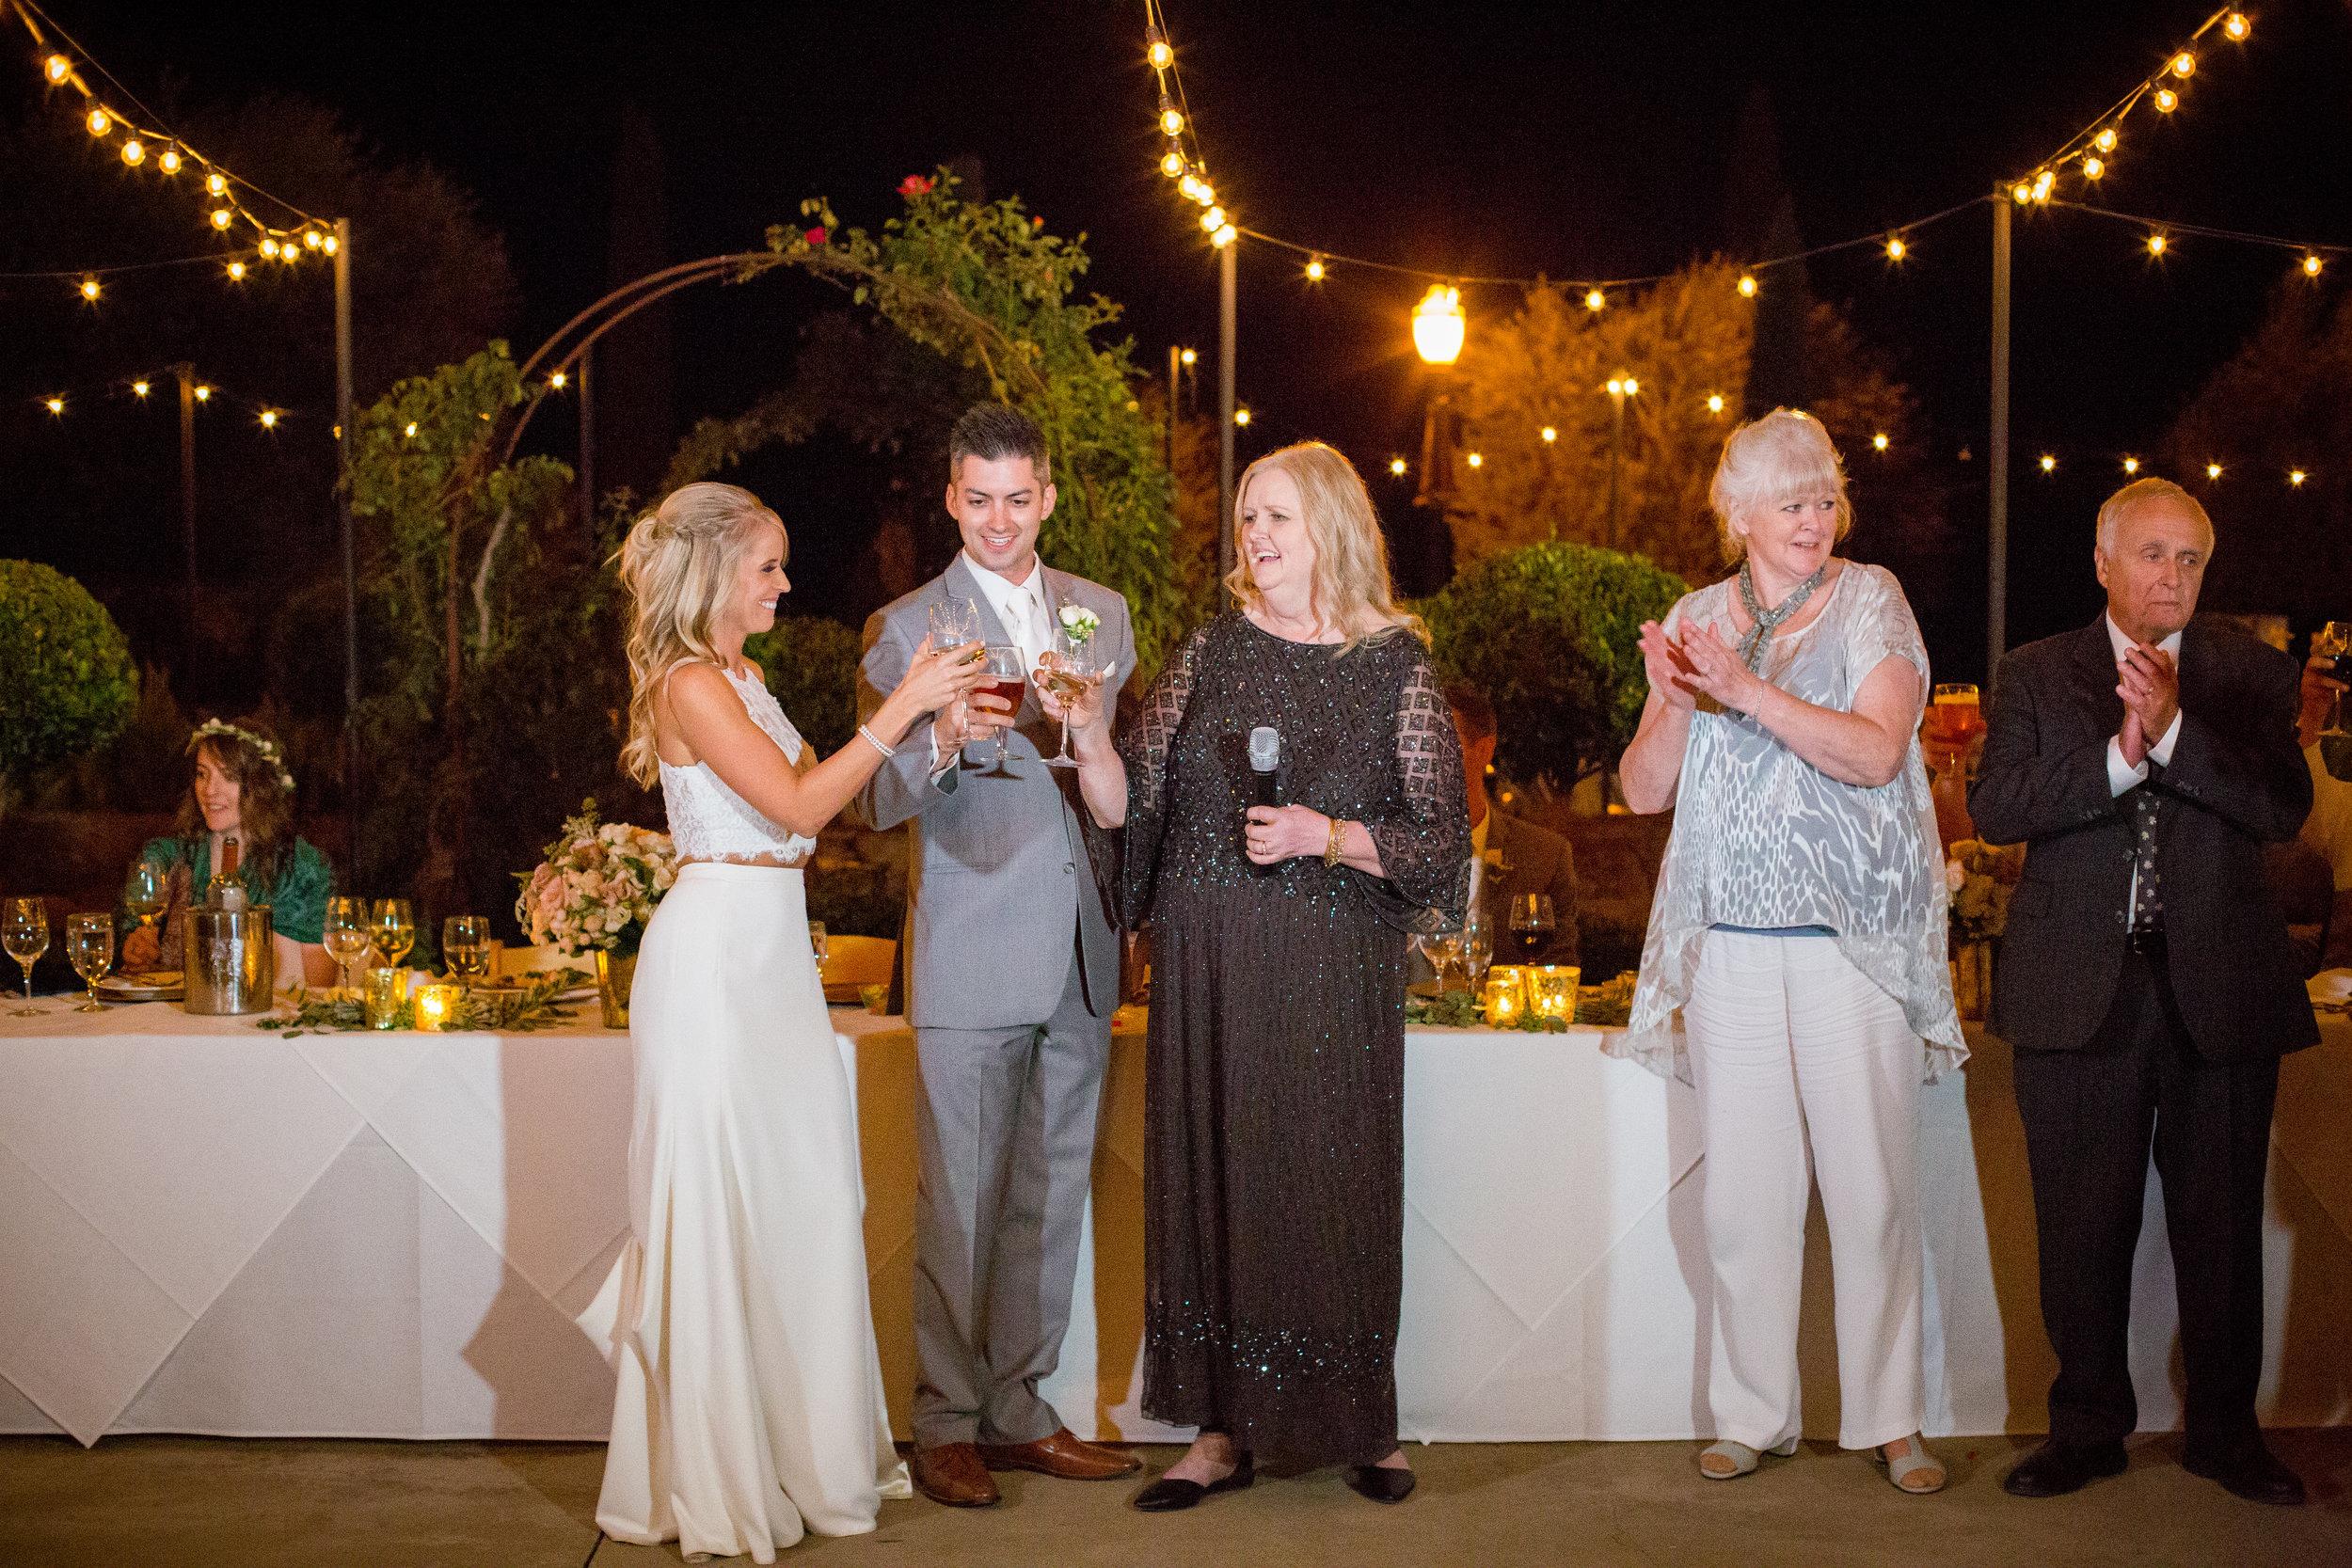 2 Jamie  Cameron - Bella Piazza Winery -  Sacramento Wedding Photographer - Ashley Teasley Photography (111 of 279).jpg